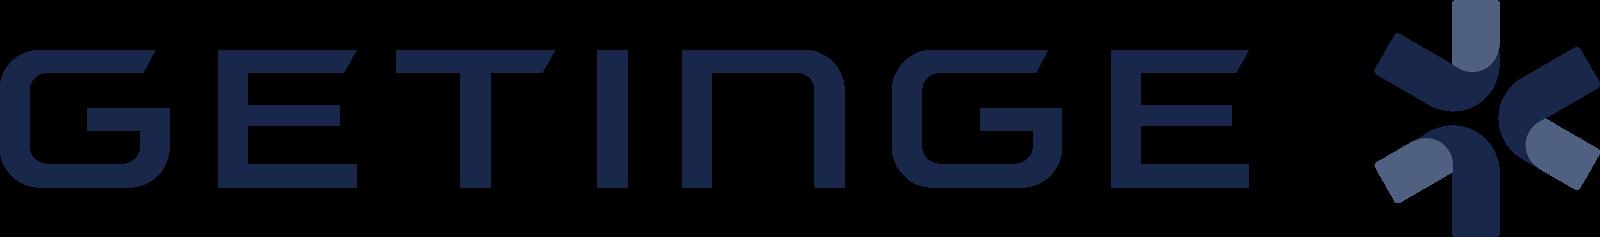 getinge rgb - 3000 px.png——标志